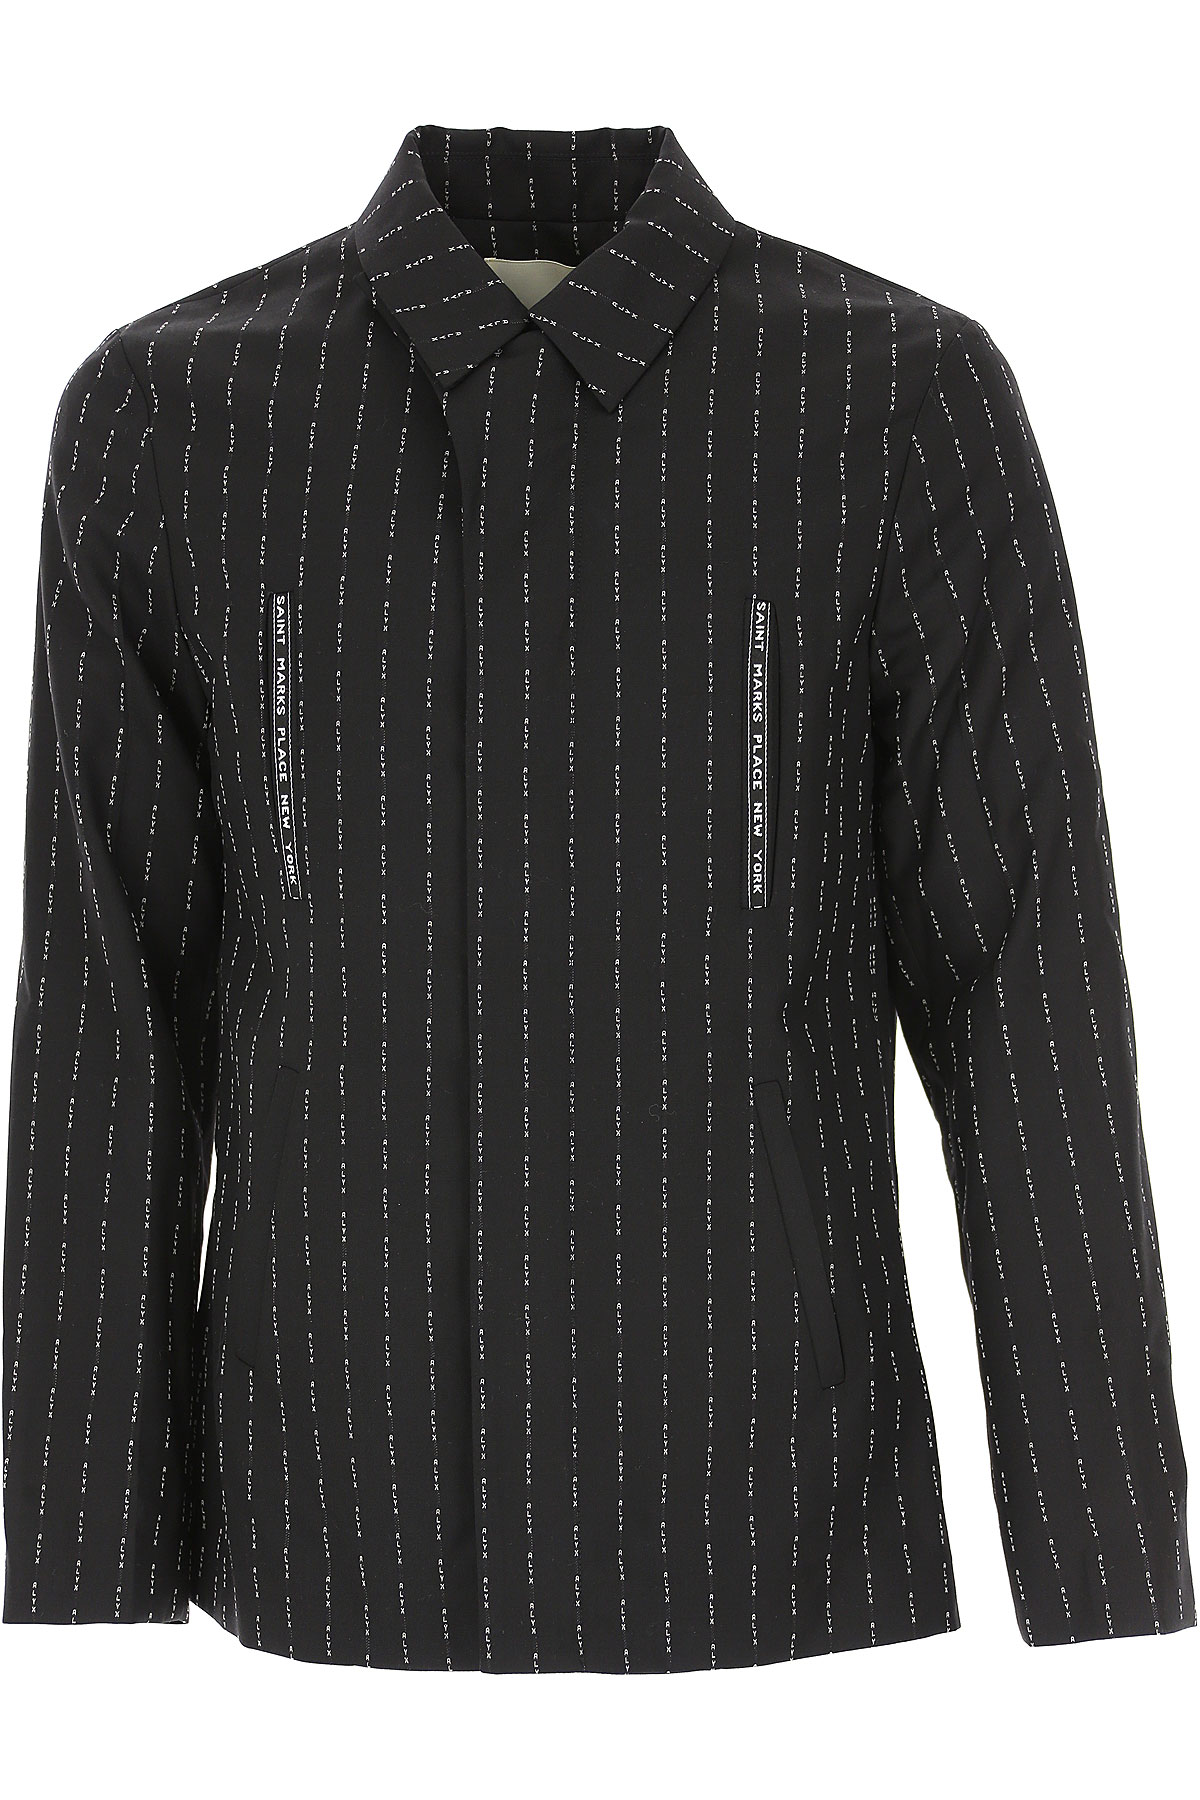 ALYX Blazer for Men, Sport Coat On Sale in Outlet, Black, Wool, 2019, L M